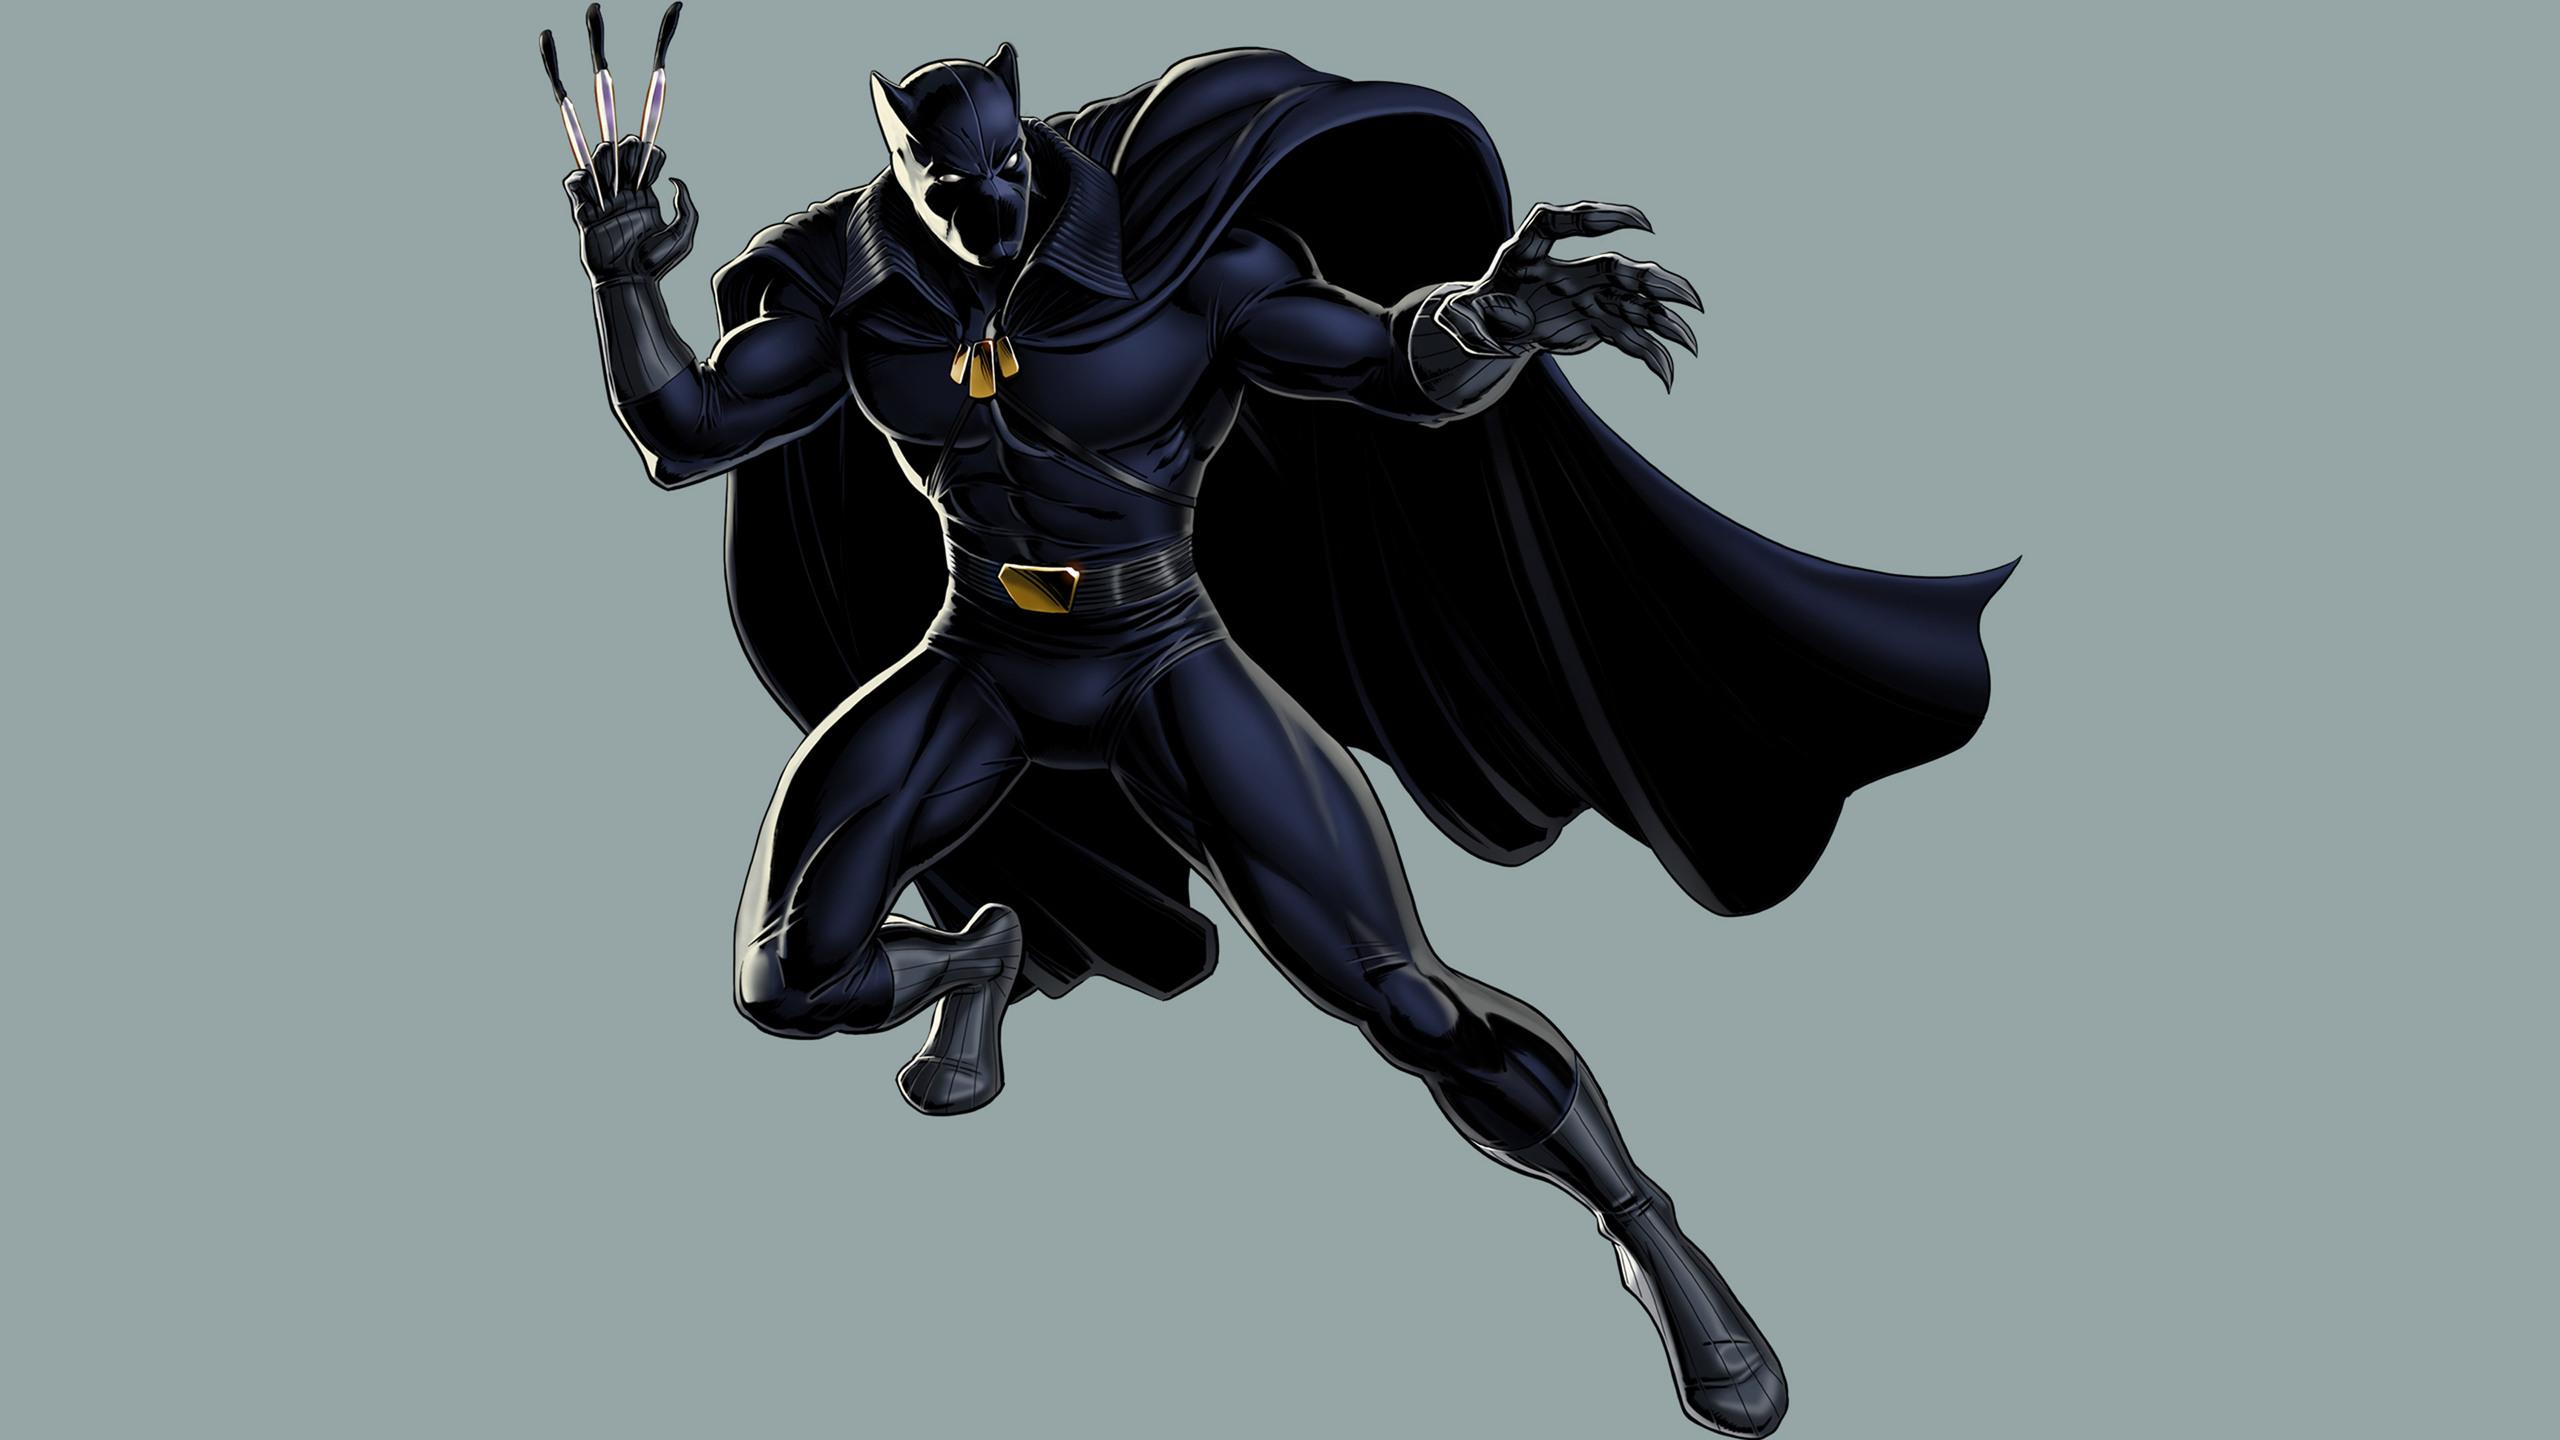 2560x1440 black panther fictional superhero 2 1440p resolution hd 4k